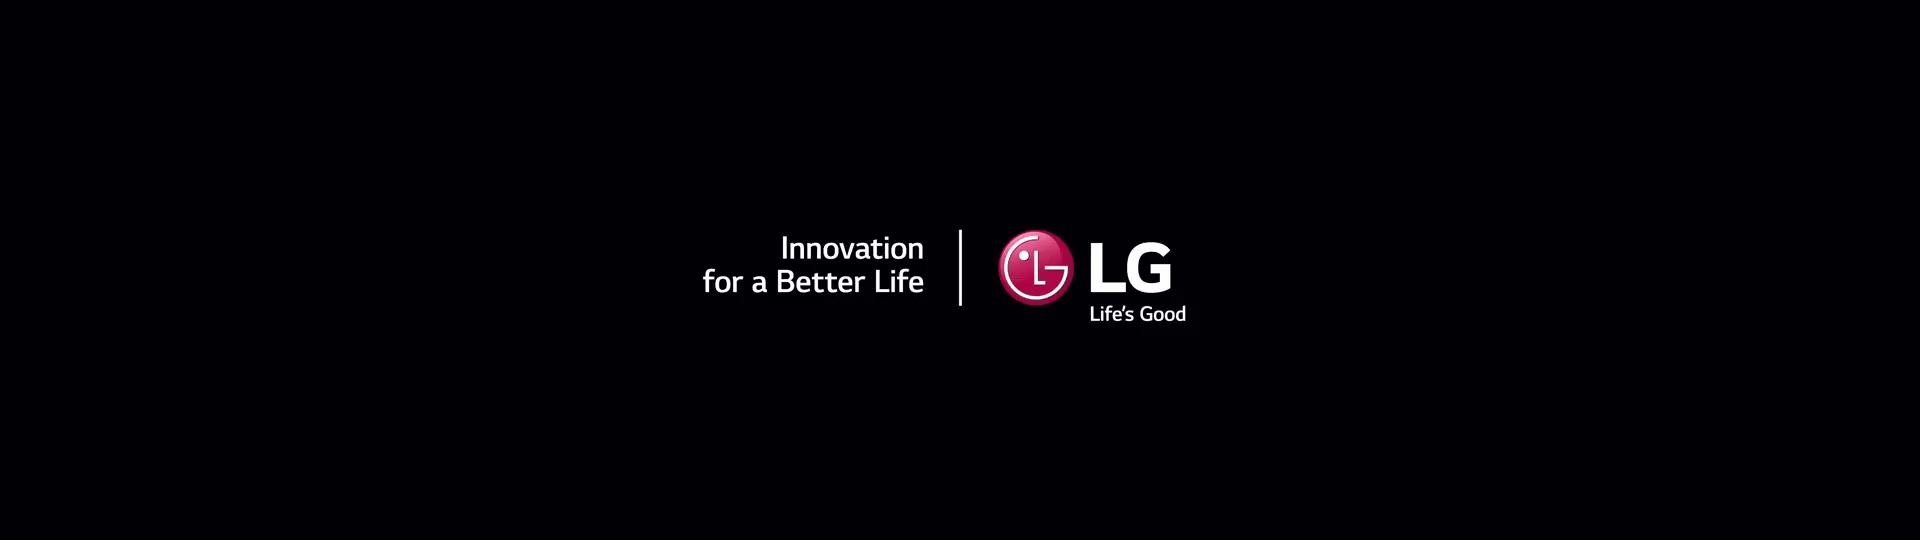 LG_49WL95C_the_ultrawide_dual_qhd_monitor_a8UC_YZC2HQ_1080p